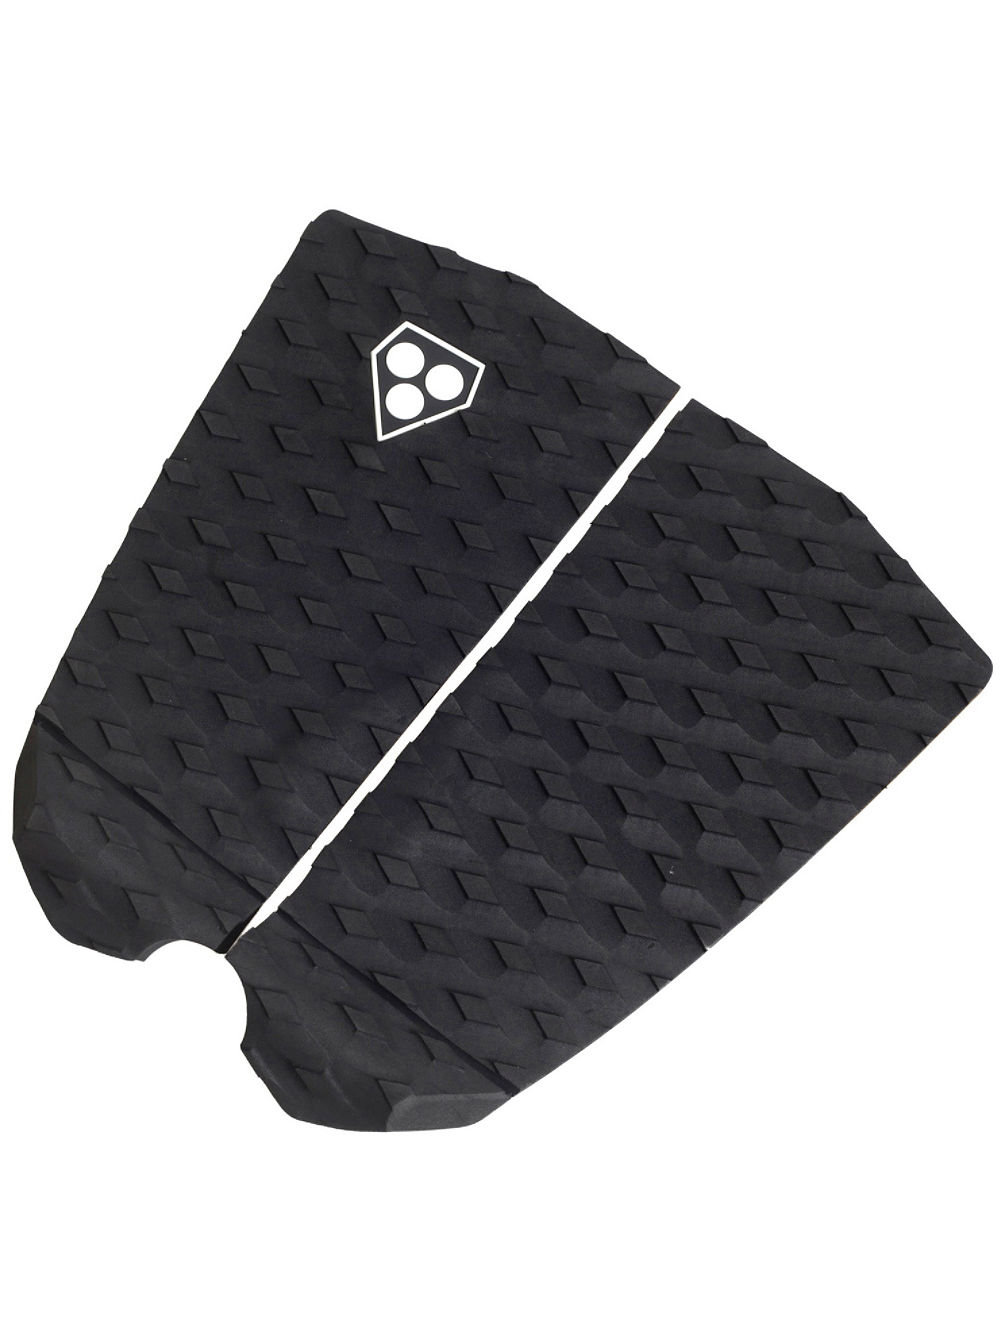 gorilla-surf-phat-two-black-pad